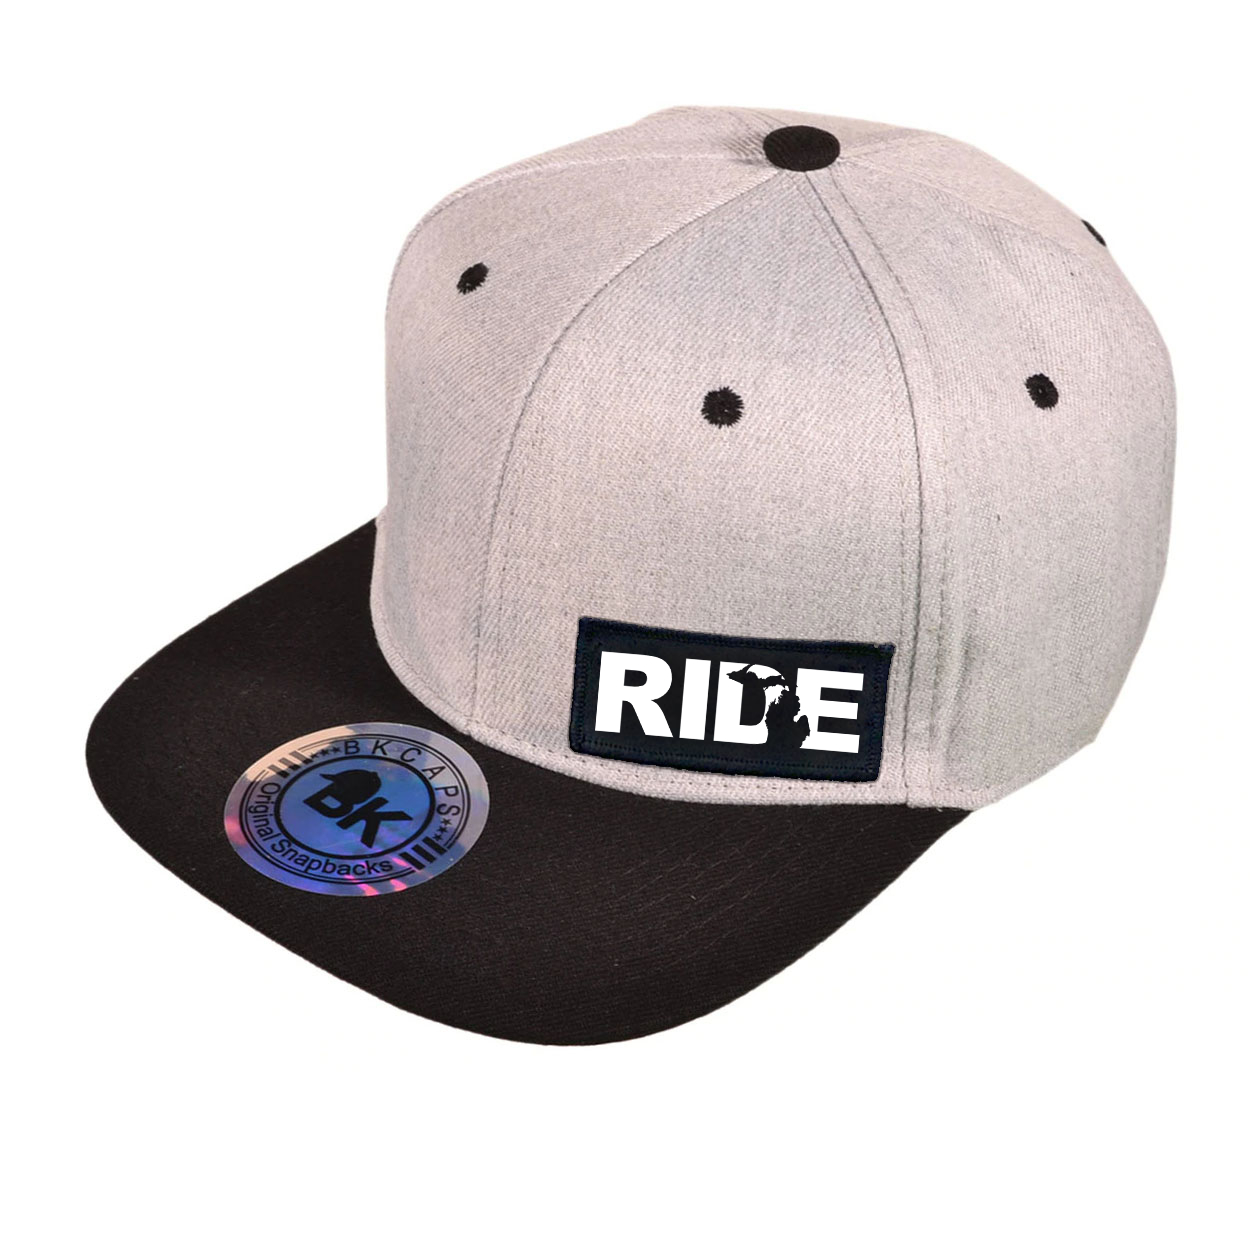 Ride Michigan Night Out Woven Patch Snapback Flat Brim Hat Heather Gray/Black (White Logo)